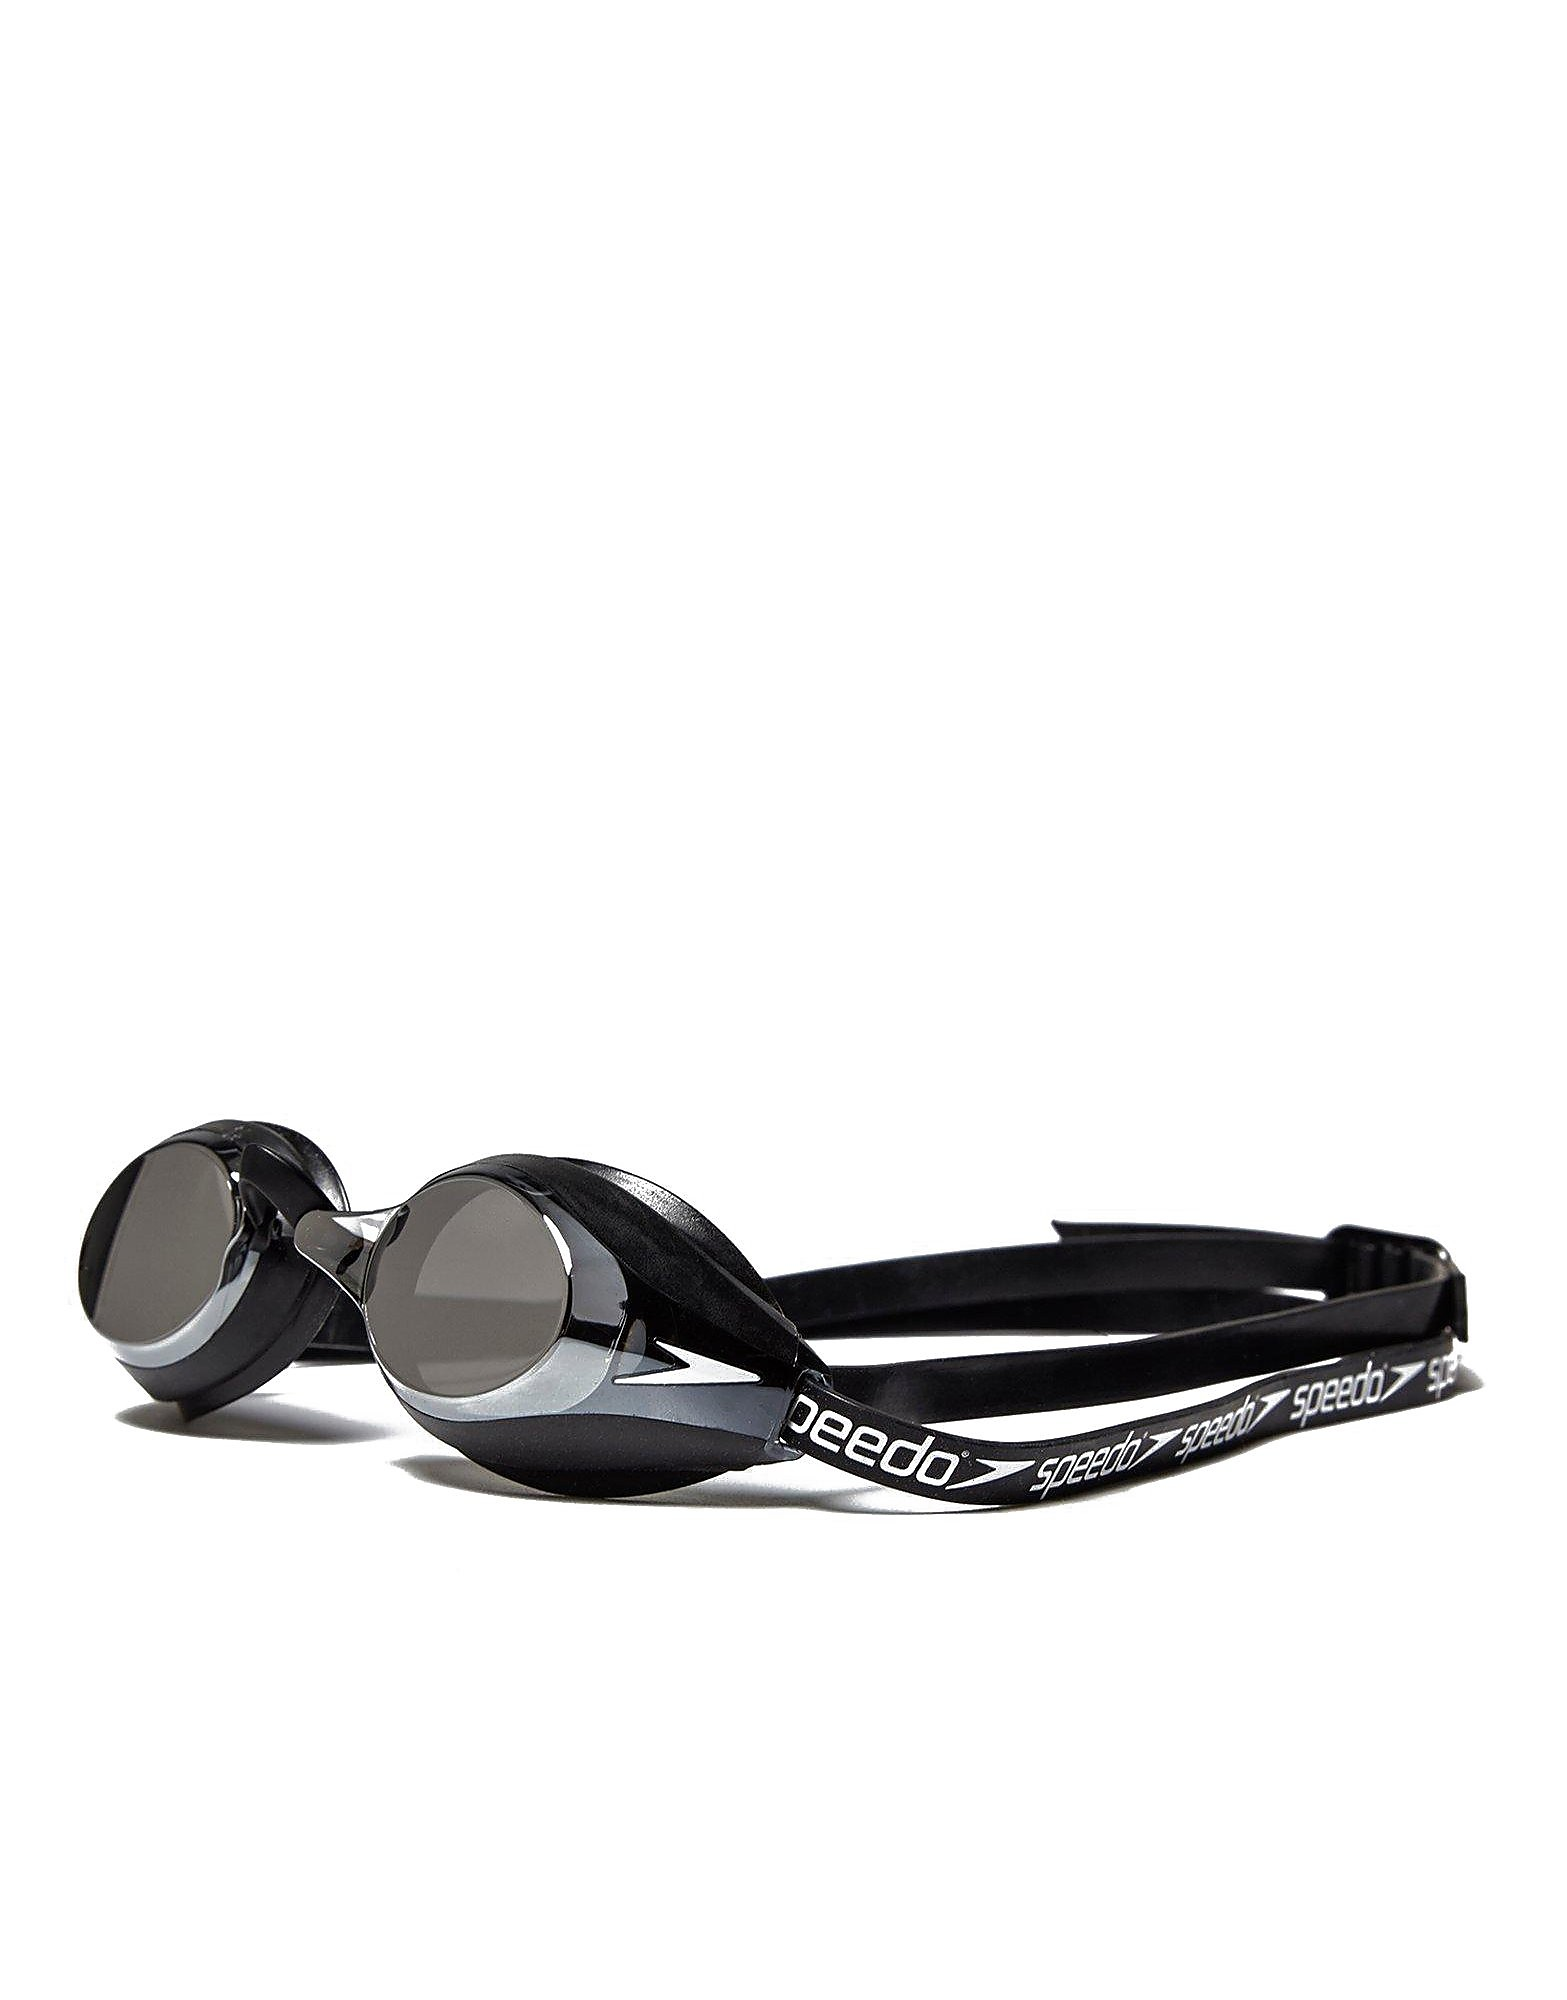 Speedo Speedsocket Mirror Goggles